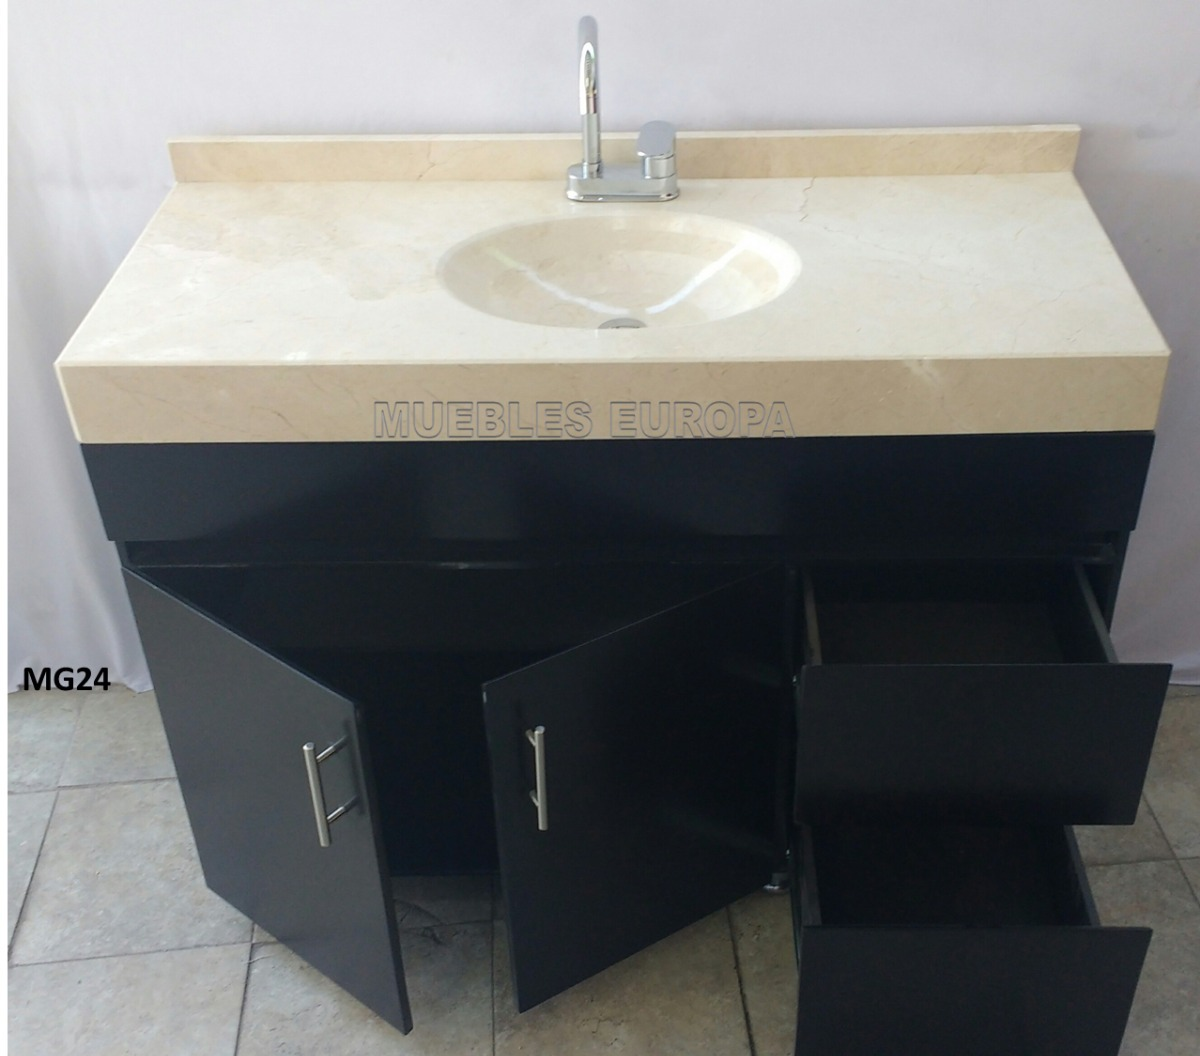 Mueble De Ba O Con Lavabo Marmol Todo Listo Para Instalar 8 En Mercado Libre